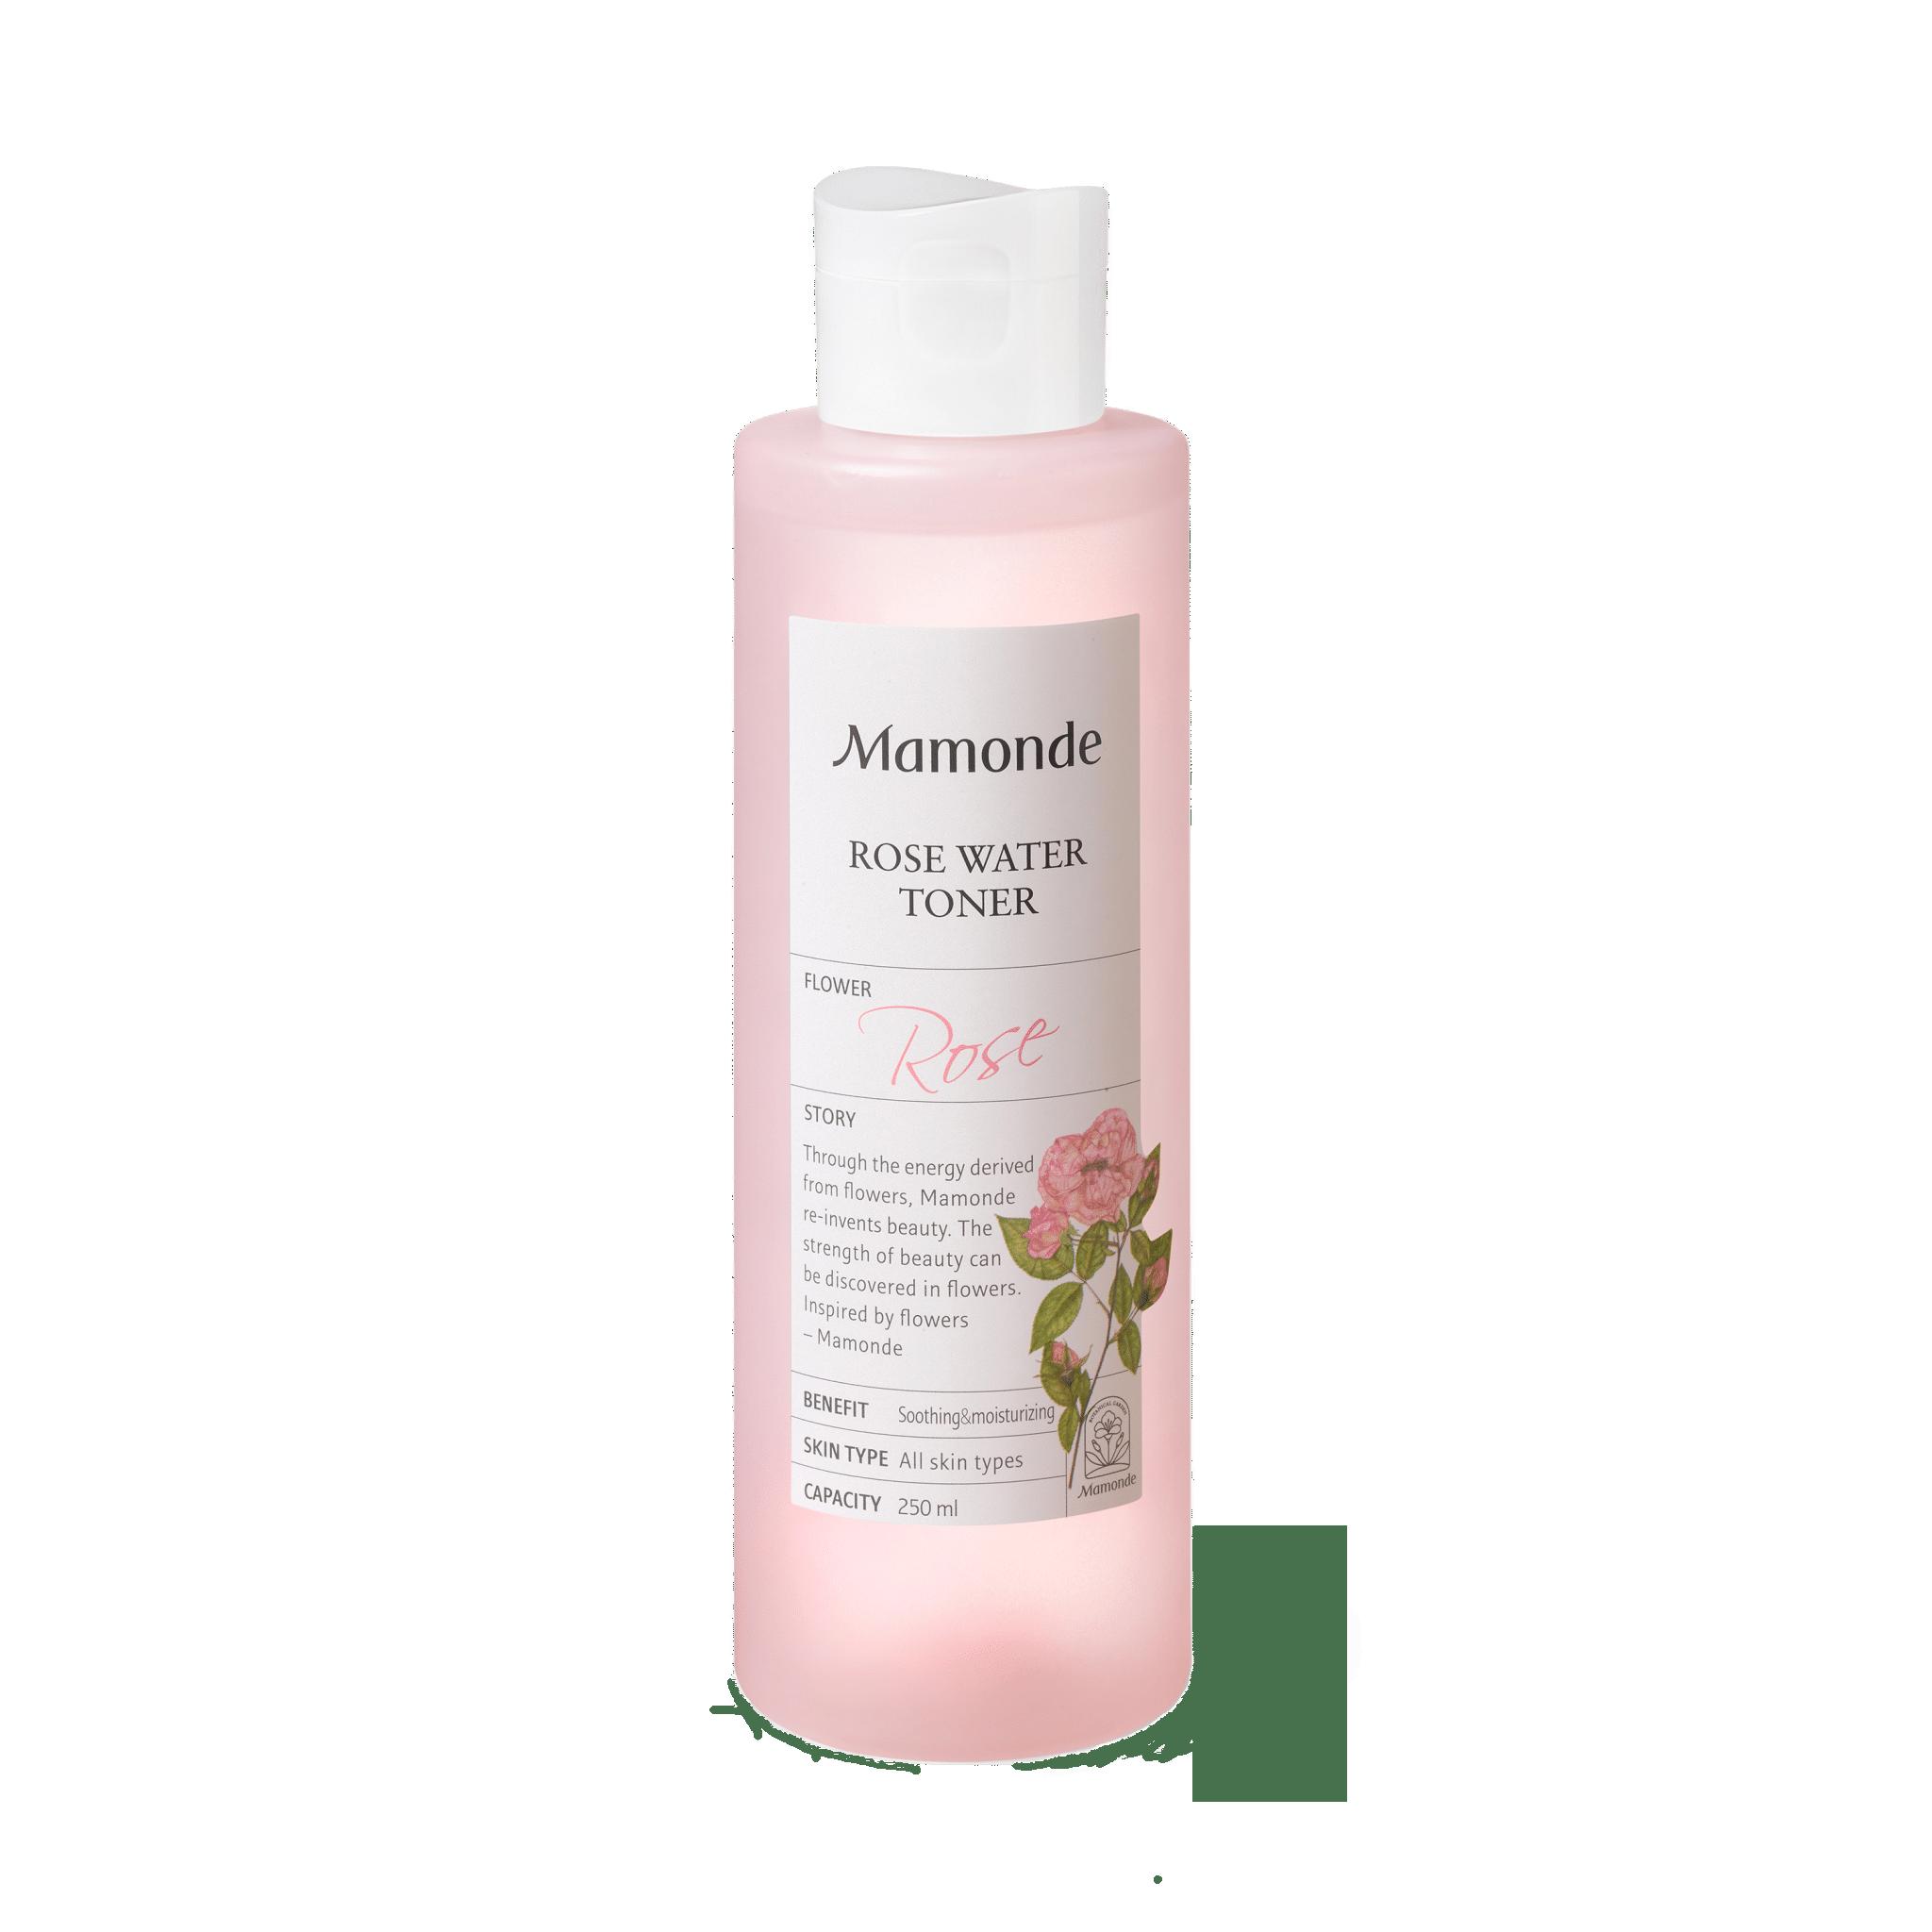 Mamonde - Rose Water Toner 1